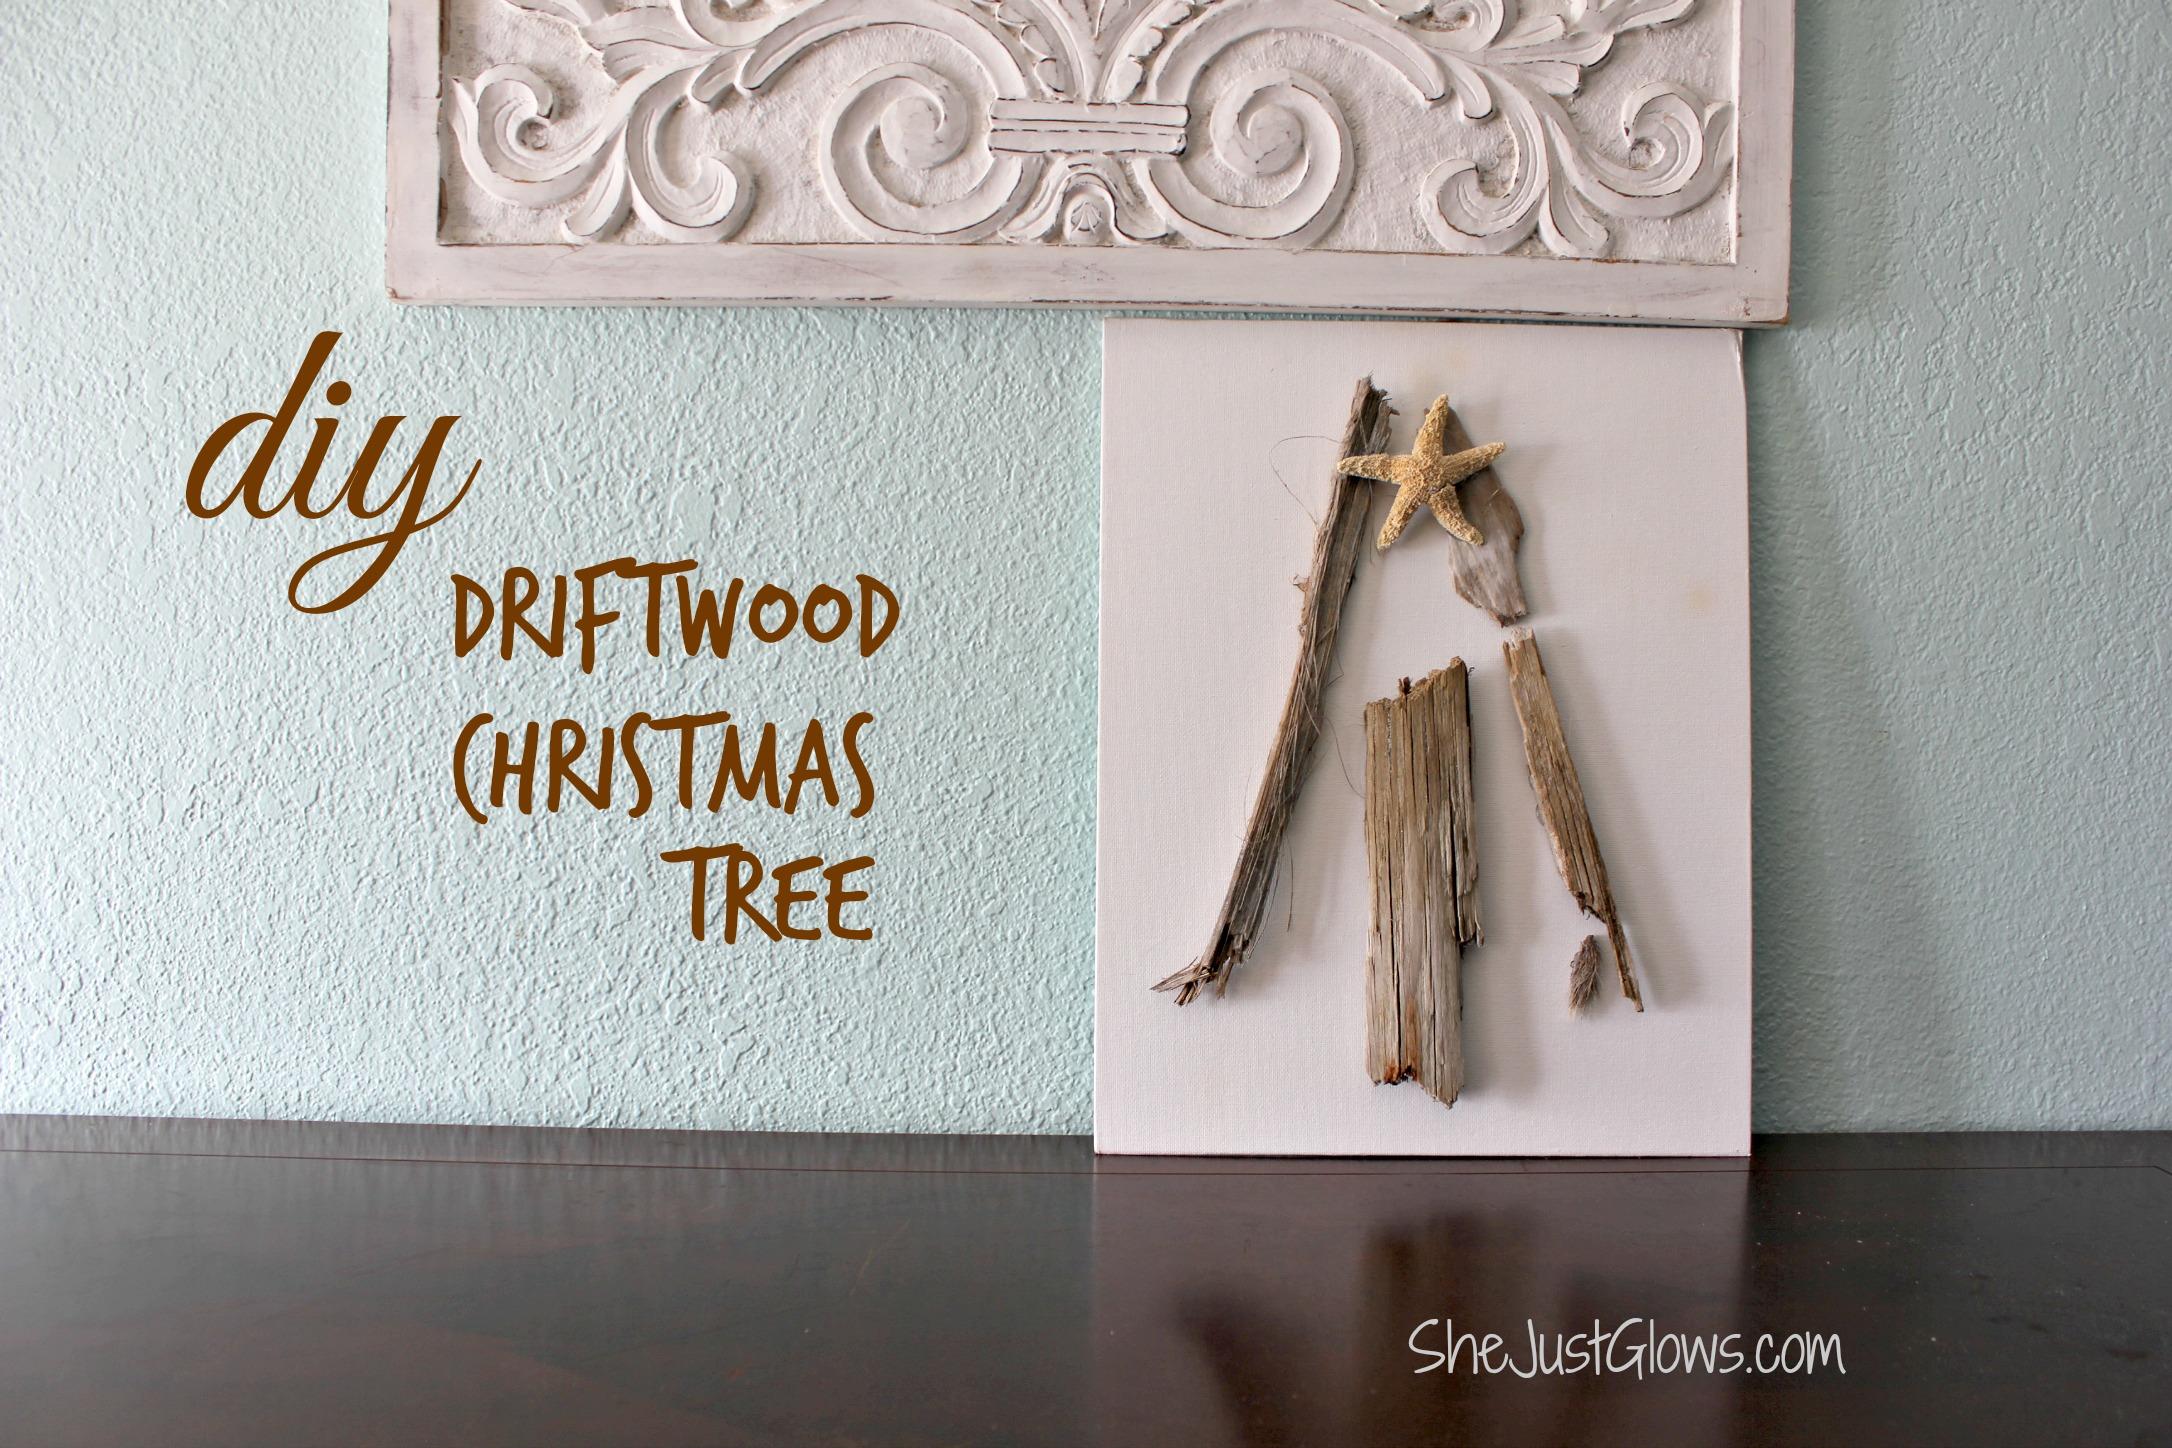 DIY Driftwood Christmas Tree Canvas SheJustGlows.com